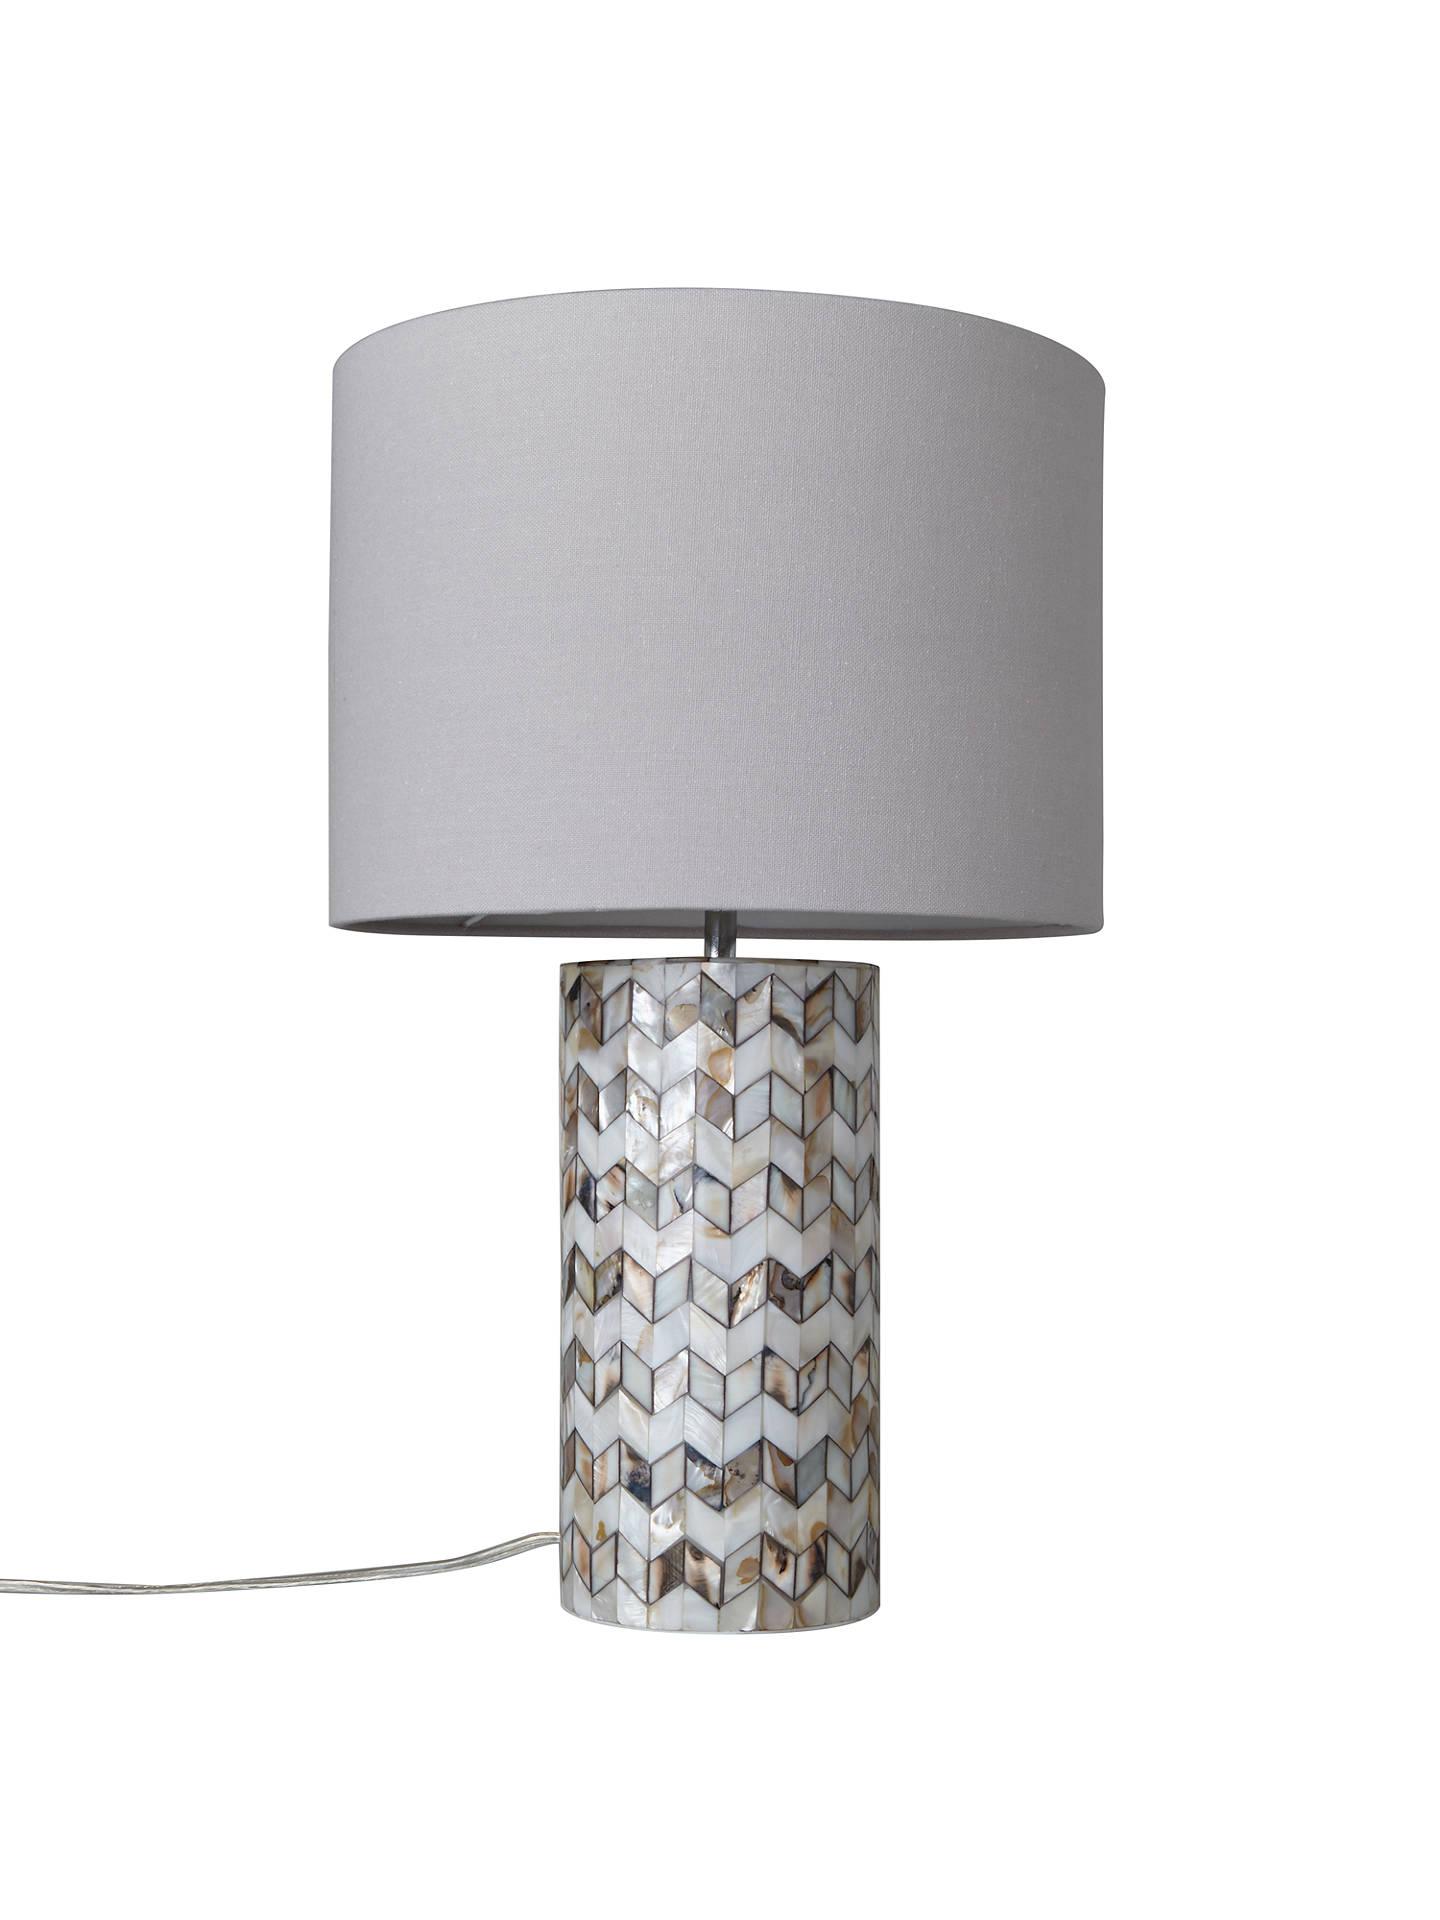 John Lewis Amp Partners Zig Zag Shell Table Lamp At John